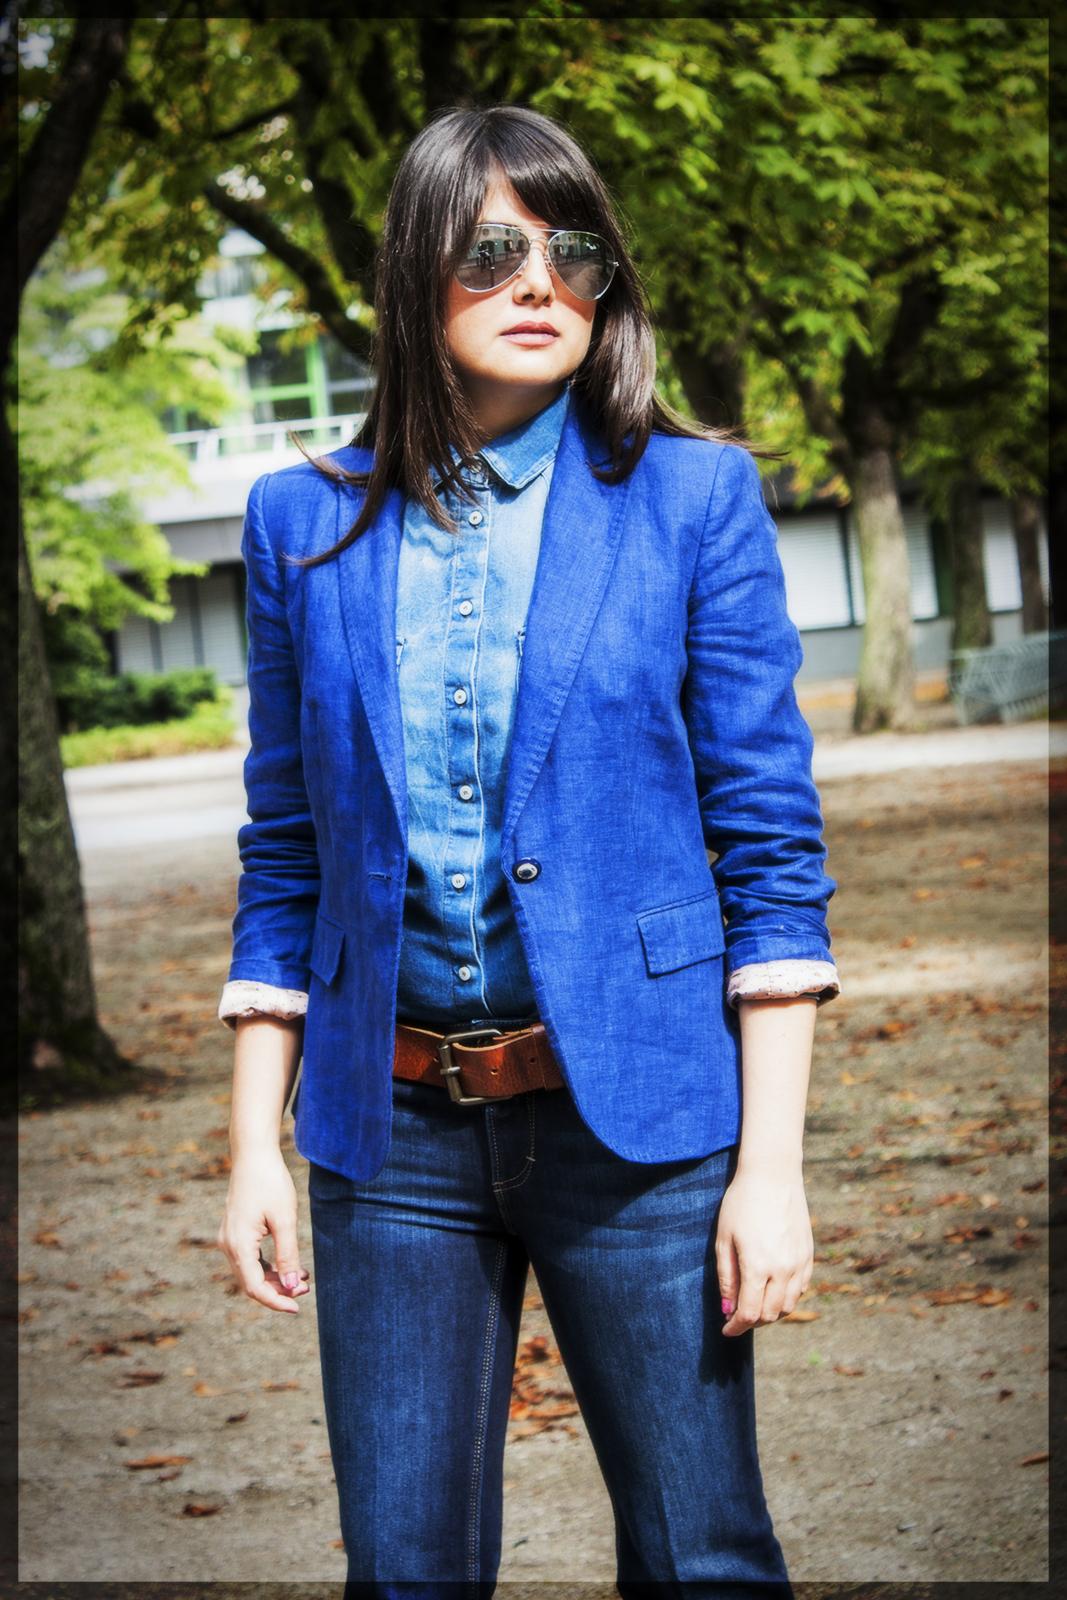 fashionambit-fashionblog-muenchen-styleblog-munich-blogger-deutschland-fashionblogger-bloggerdeutschland-style-blog-lifestyle-blog-modeblog-denim-outfit-